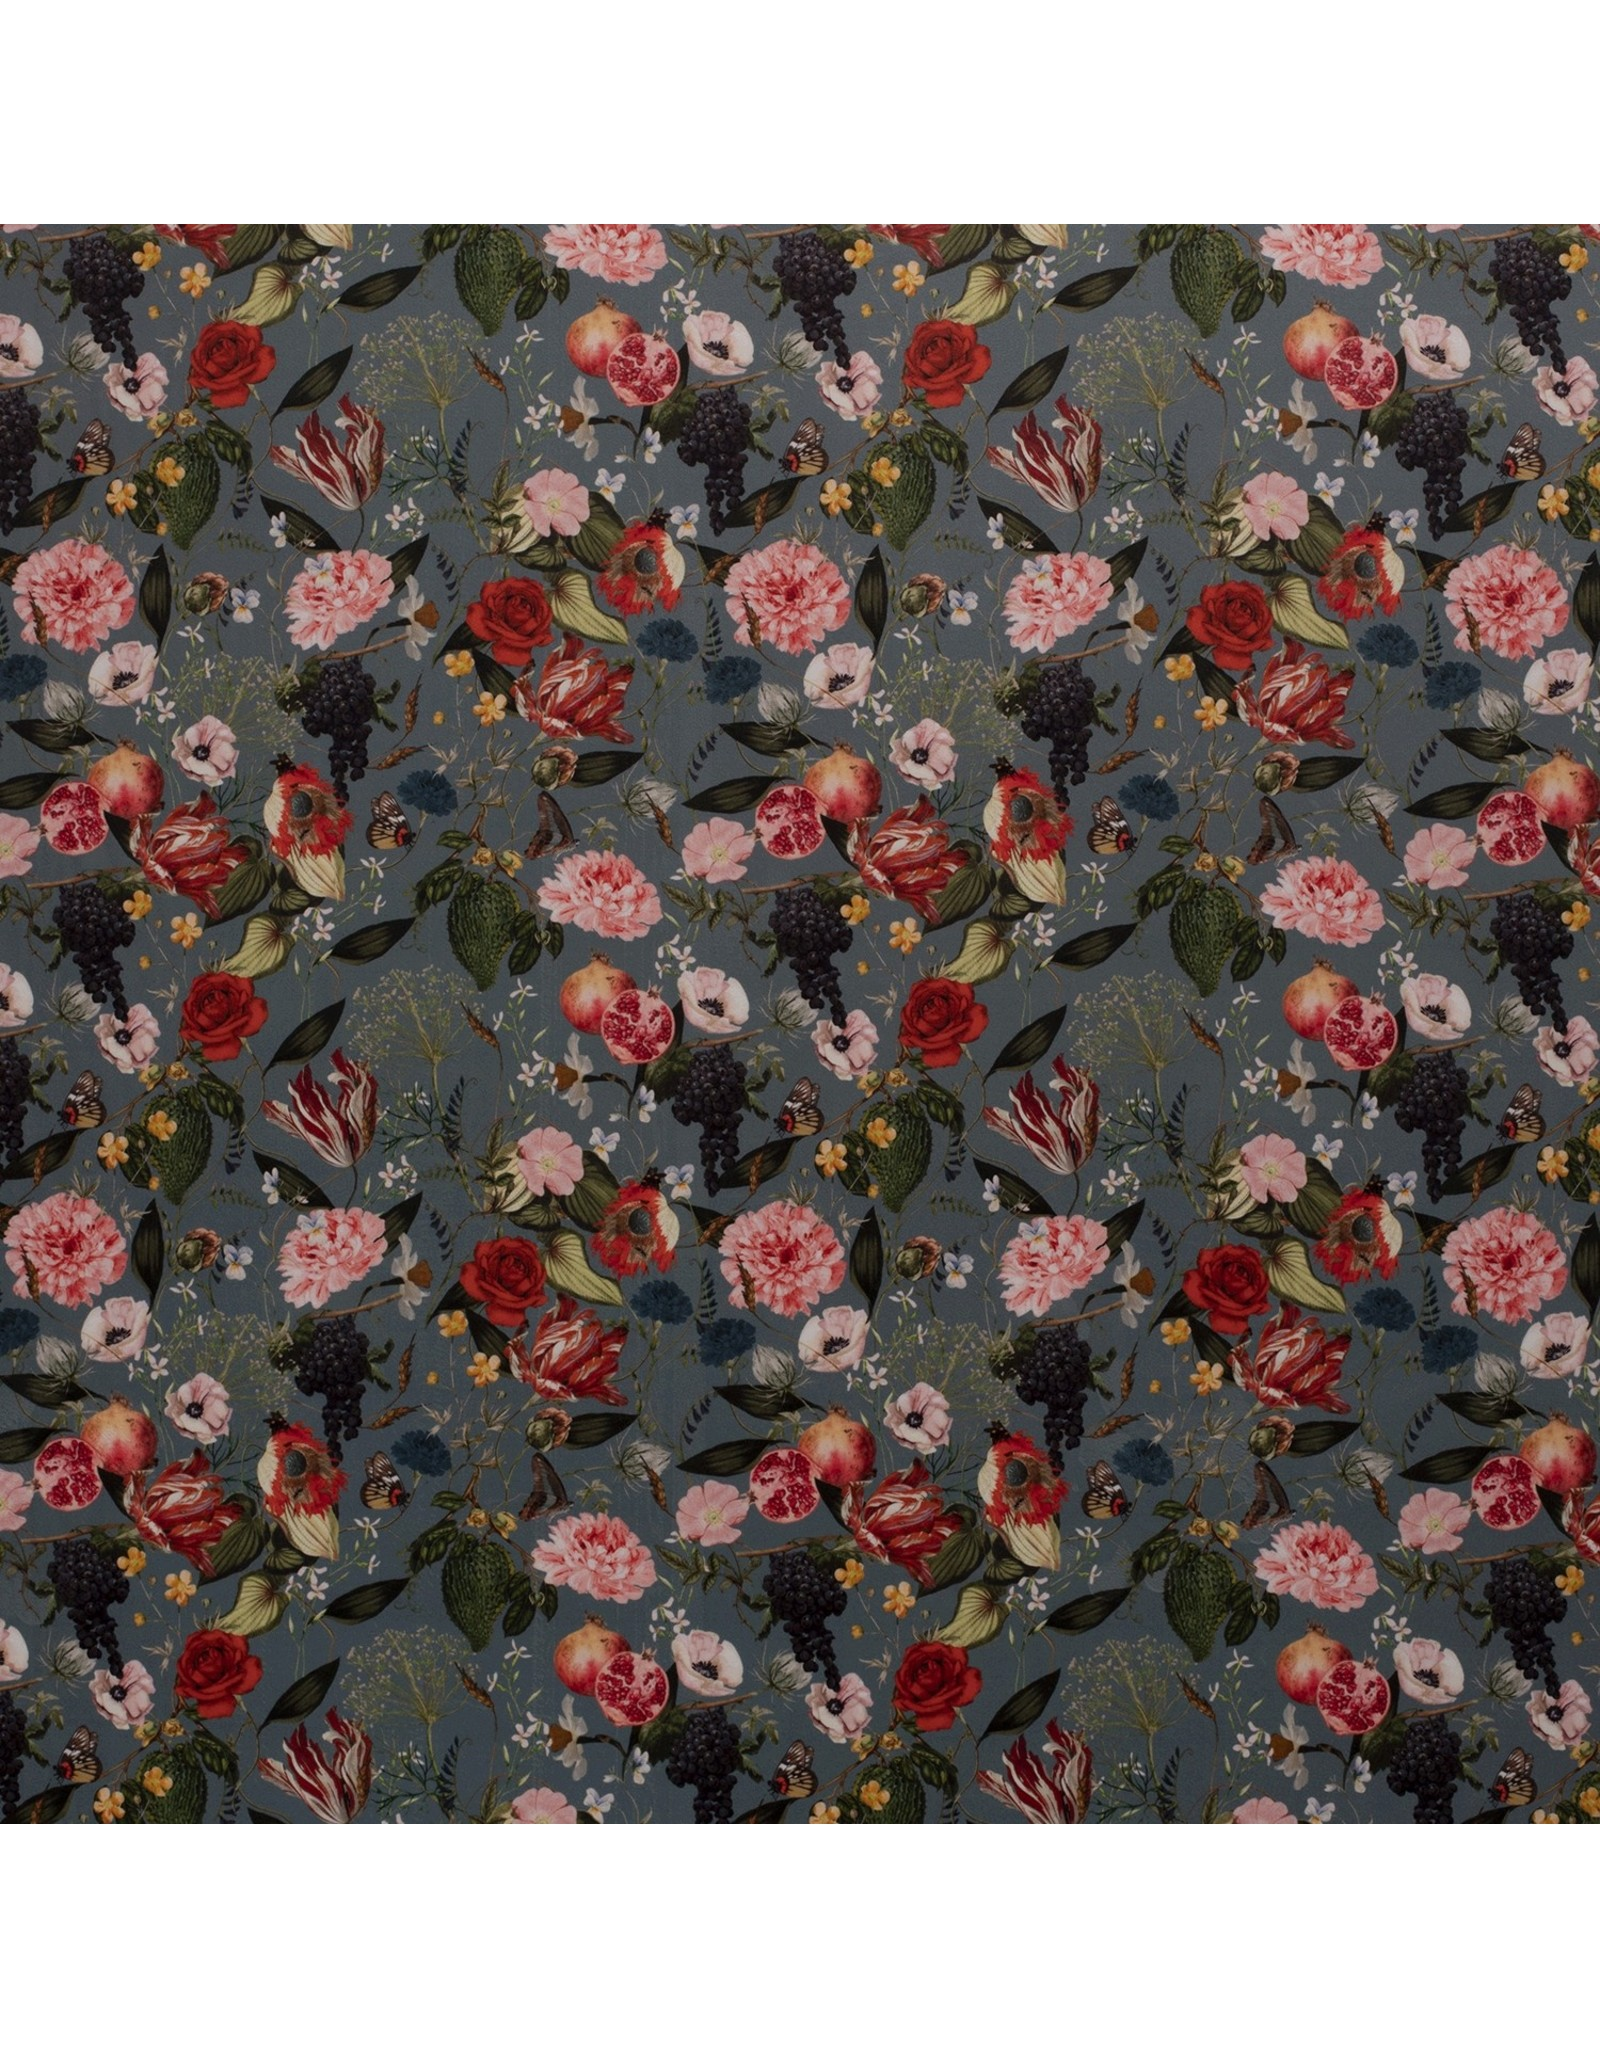 Nobodeco Home Samt stoff Blumen Indigo